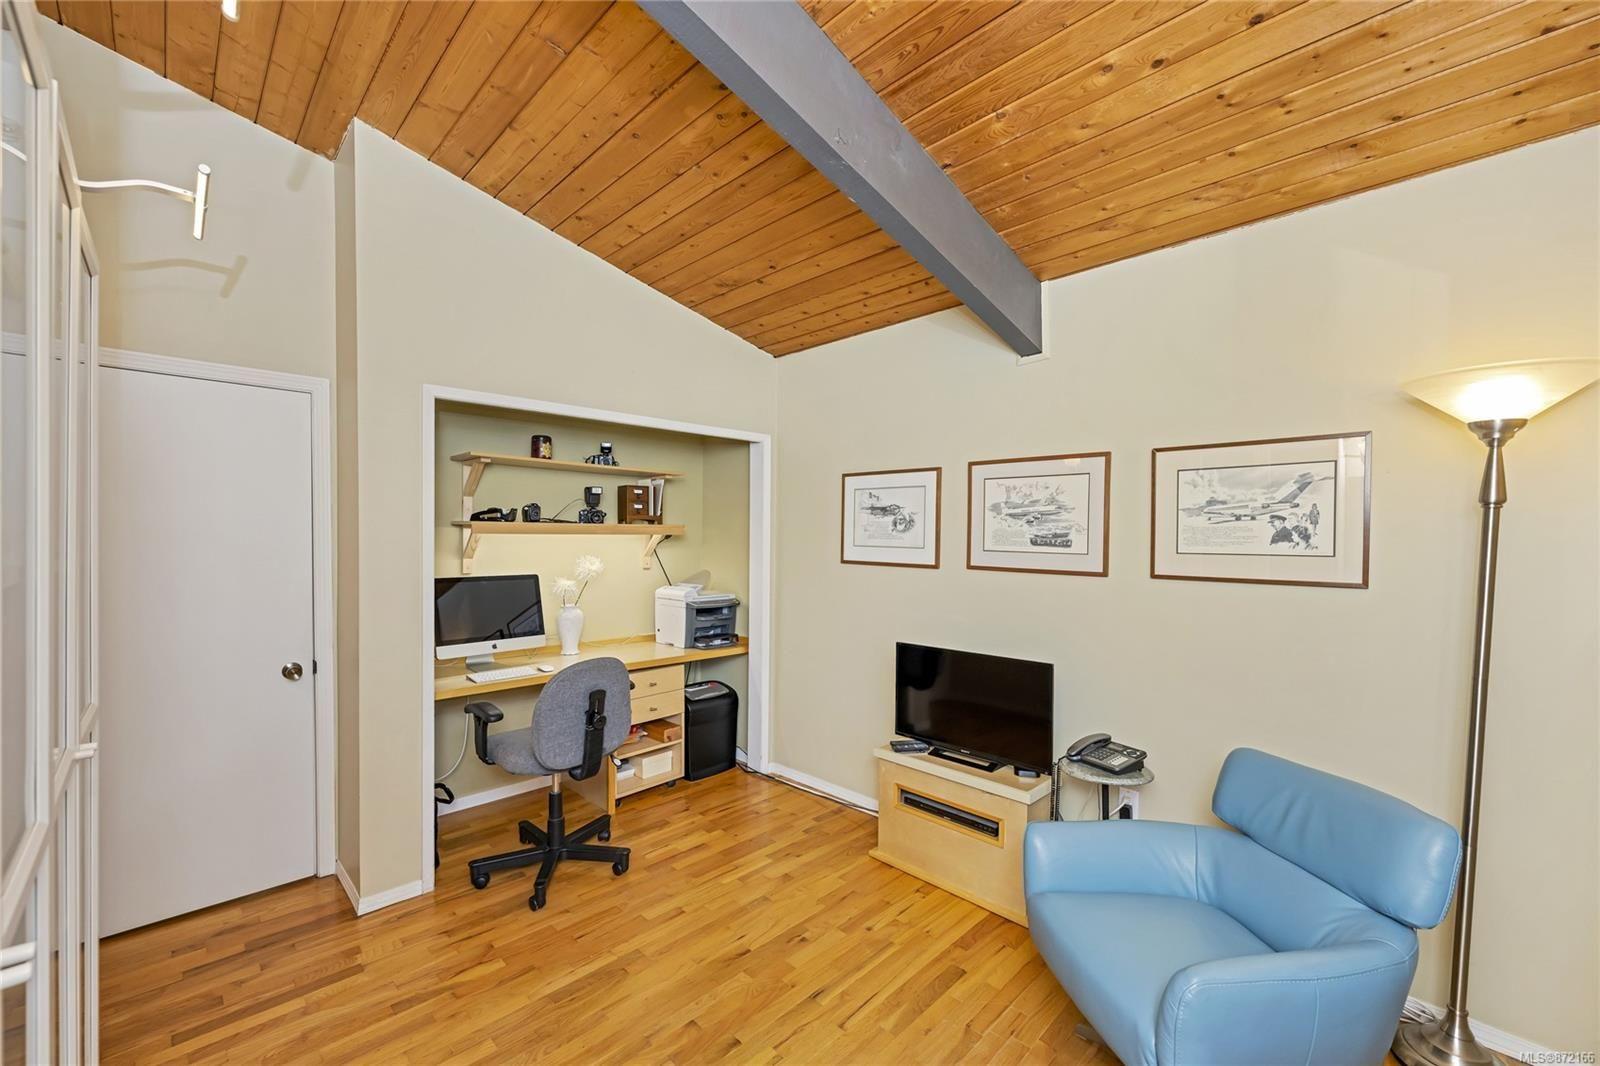 Photo 16: Photos: 1690 Blair Ave in : SE Lambrick Park House for sale (Saanich East)  : MLS®# 872166